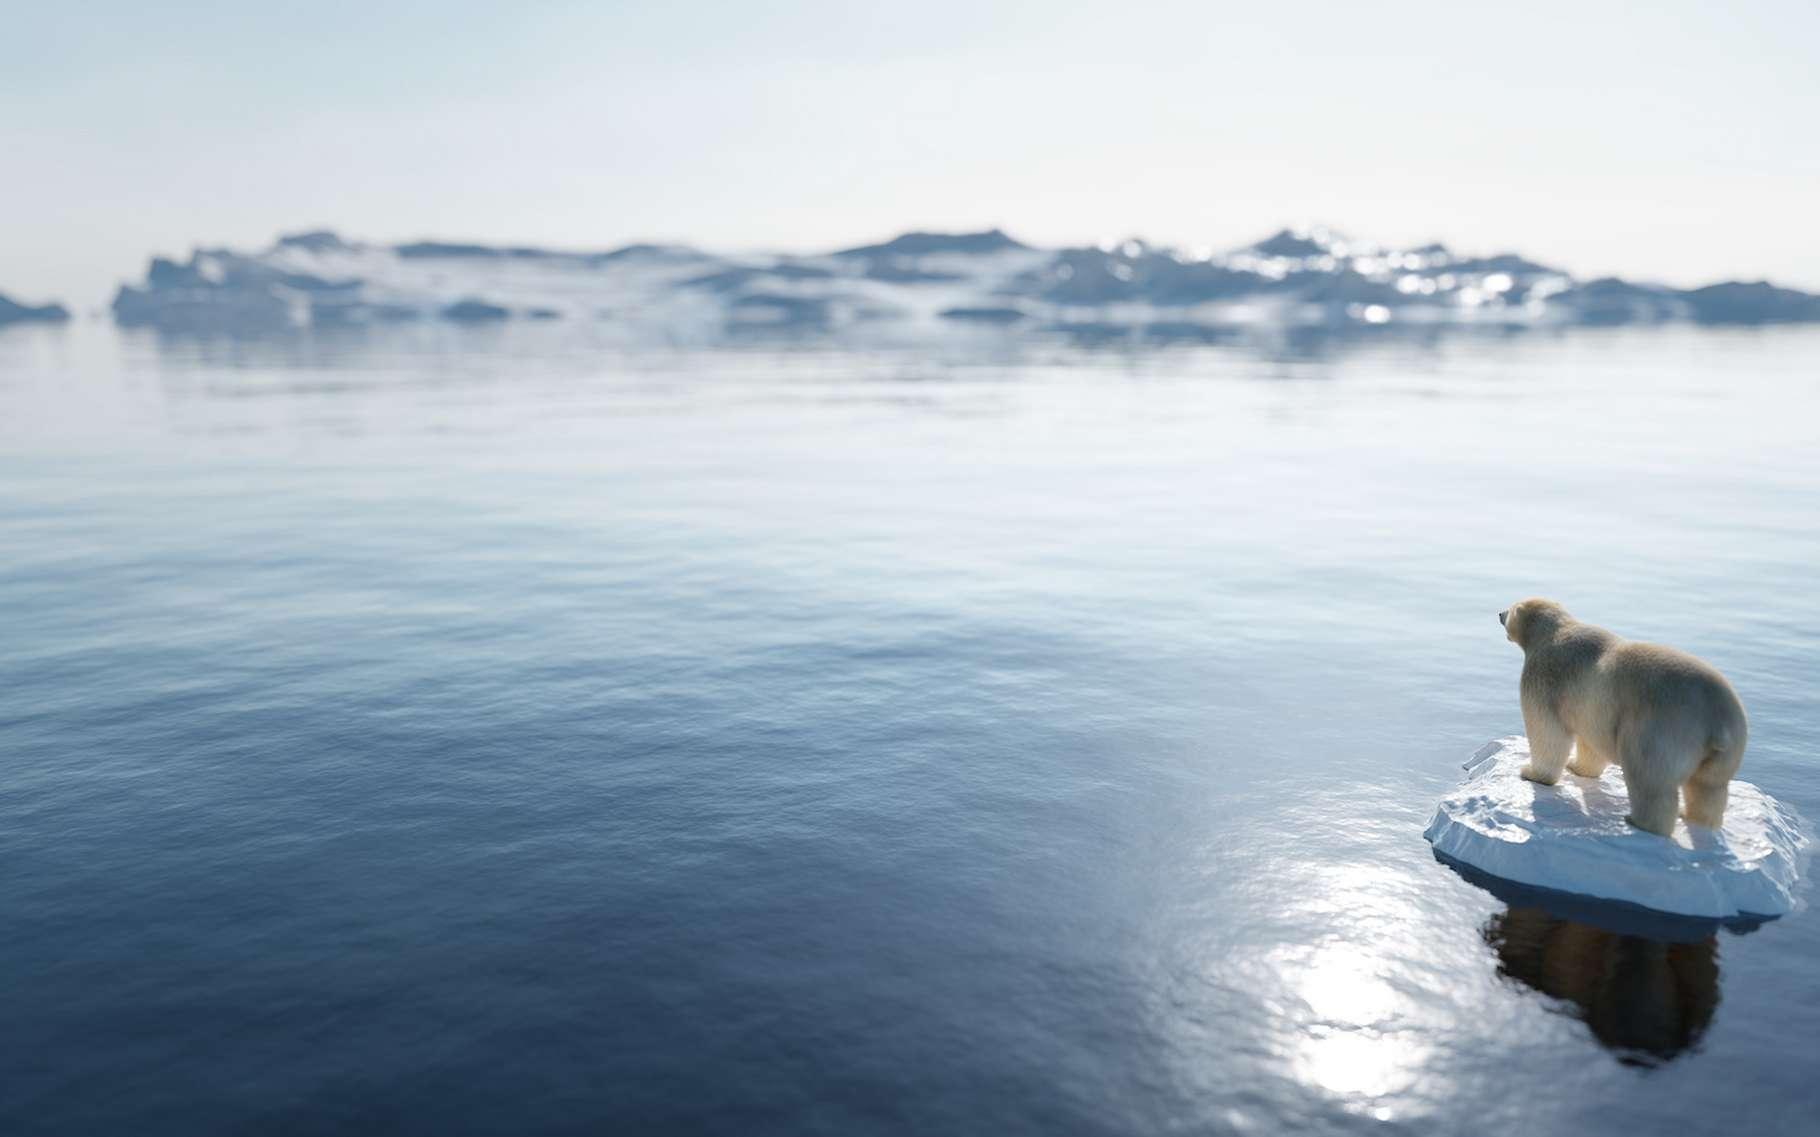 L'Arctique se réchauffe. © Photocreo Bednarek, Adobe Stock